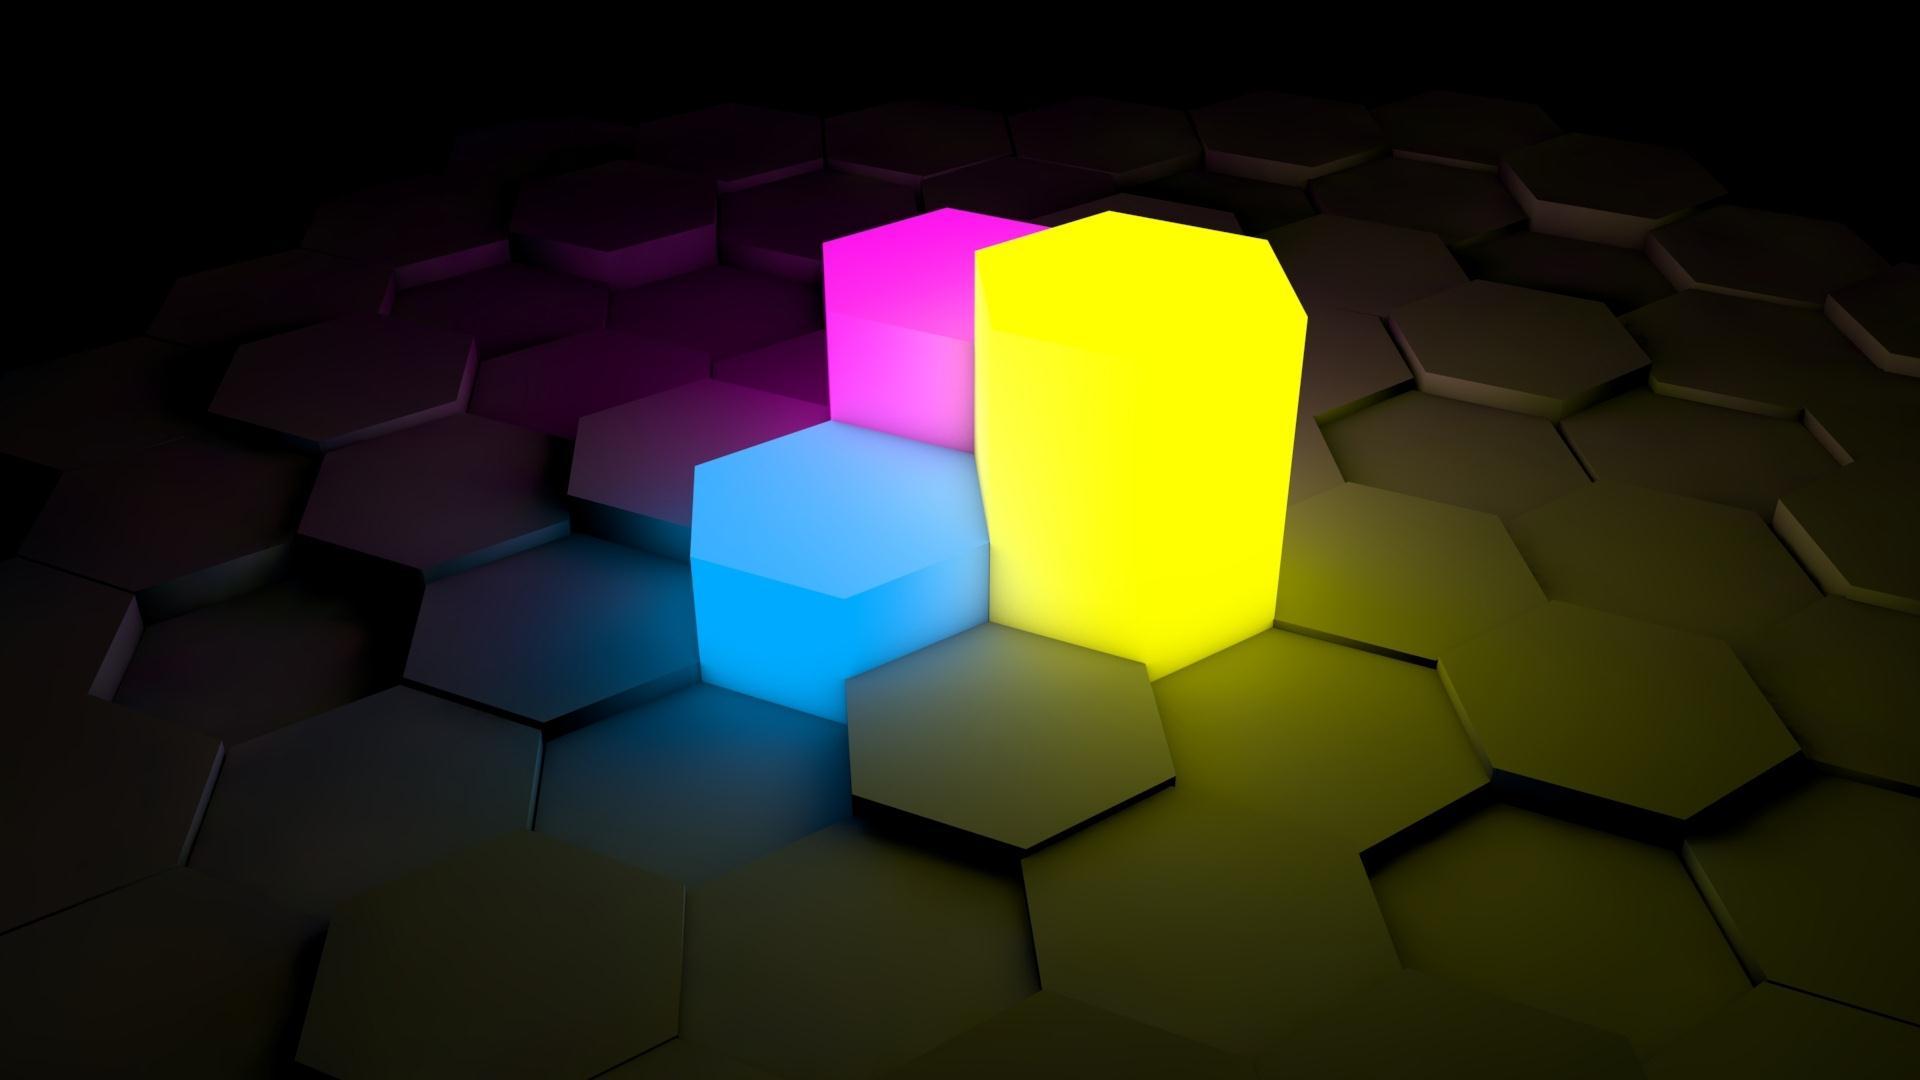 Figurines Lights On Neon Surface Wallpaper